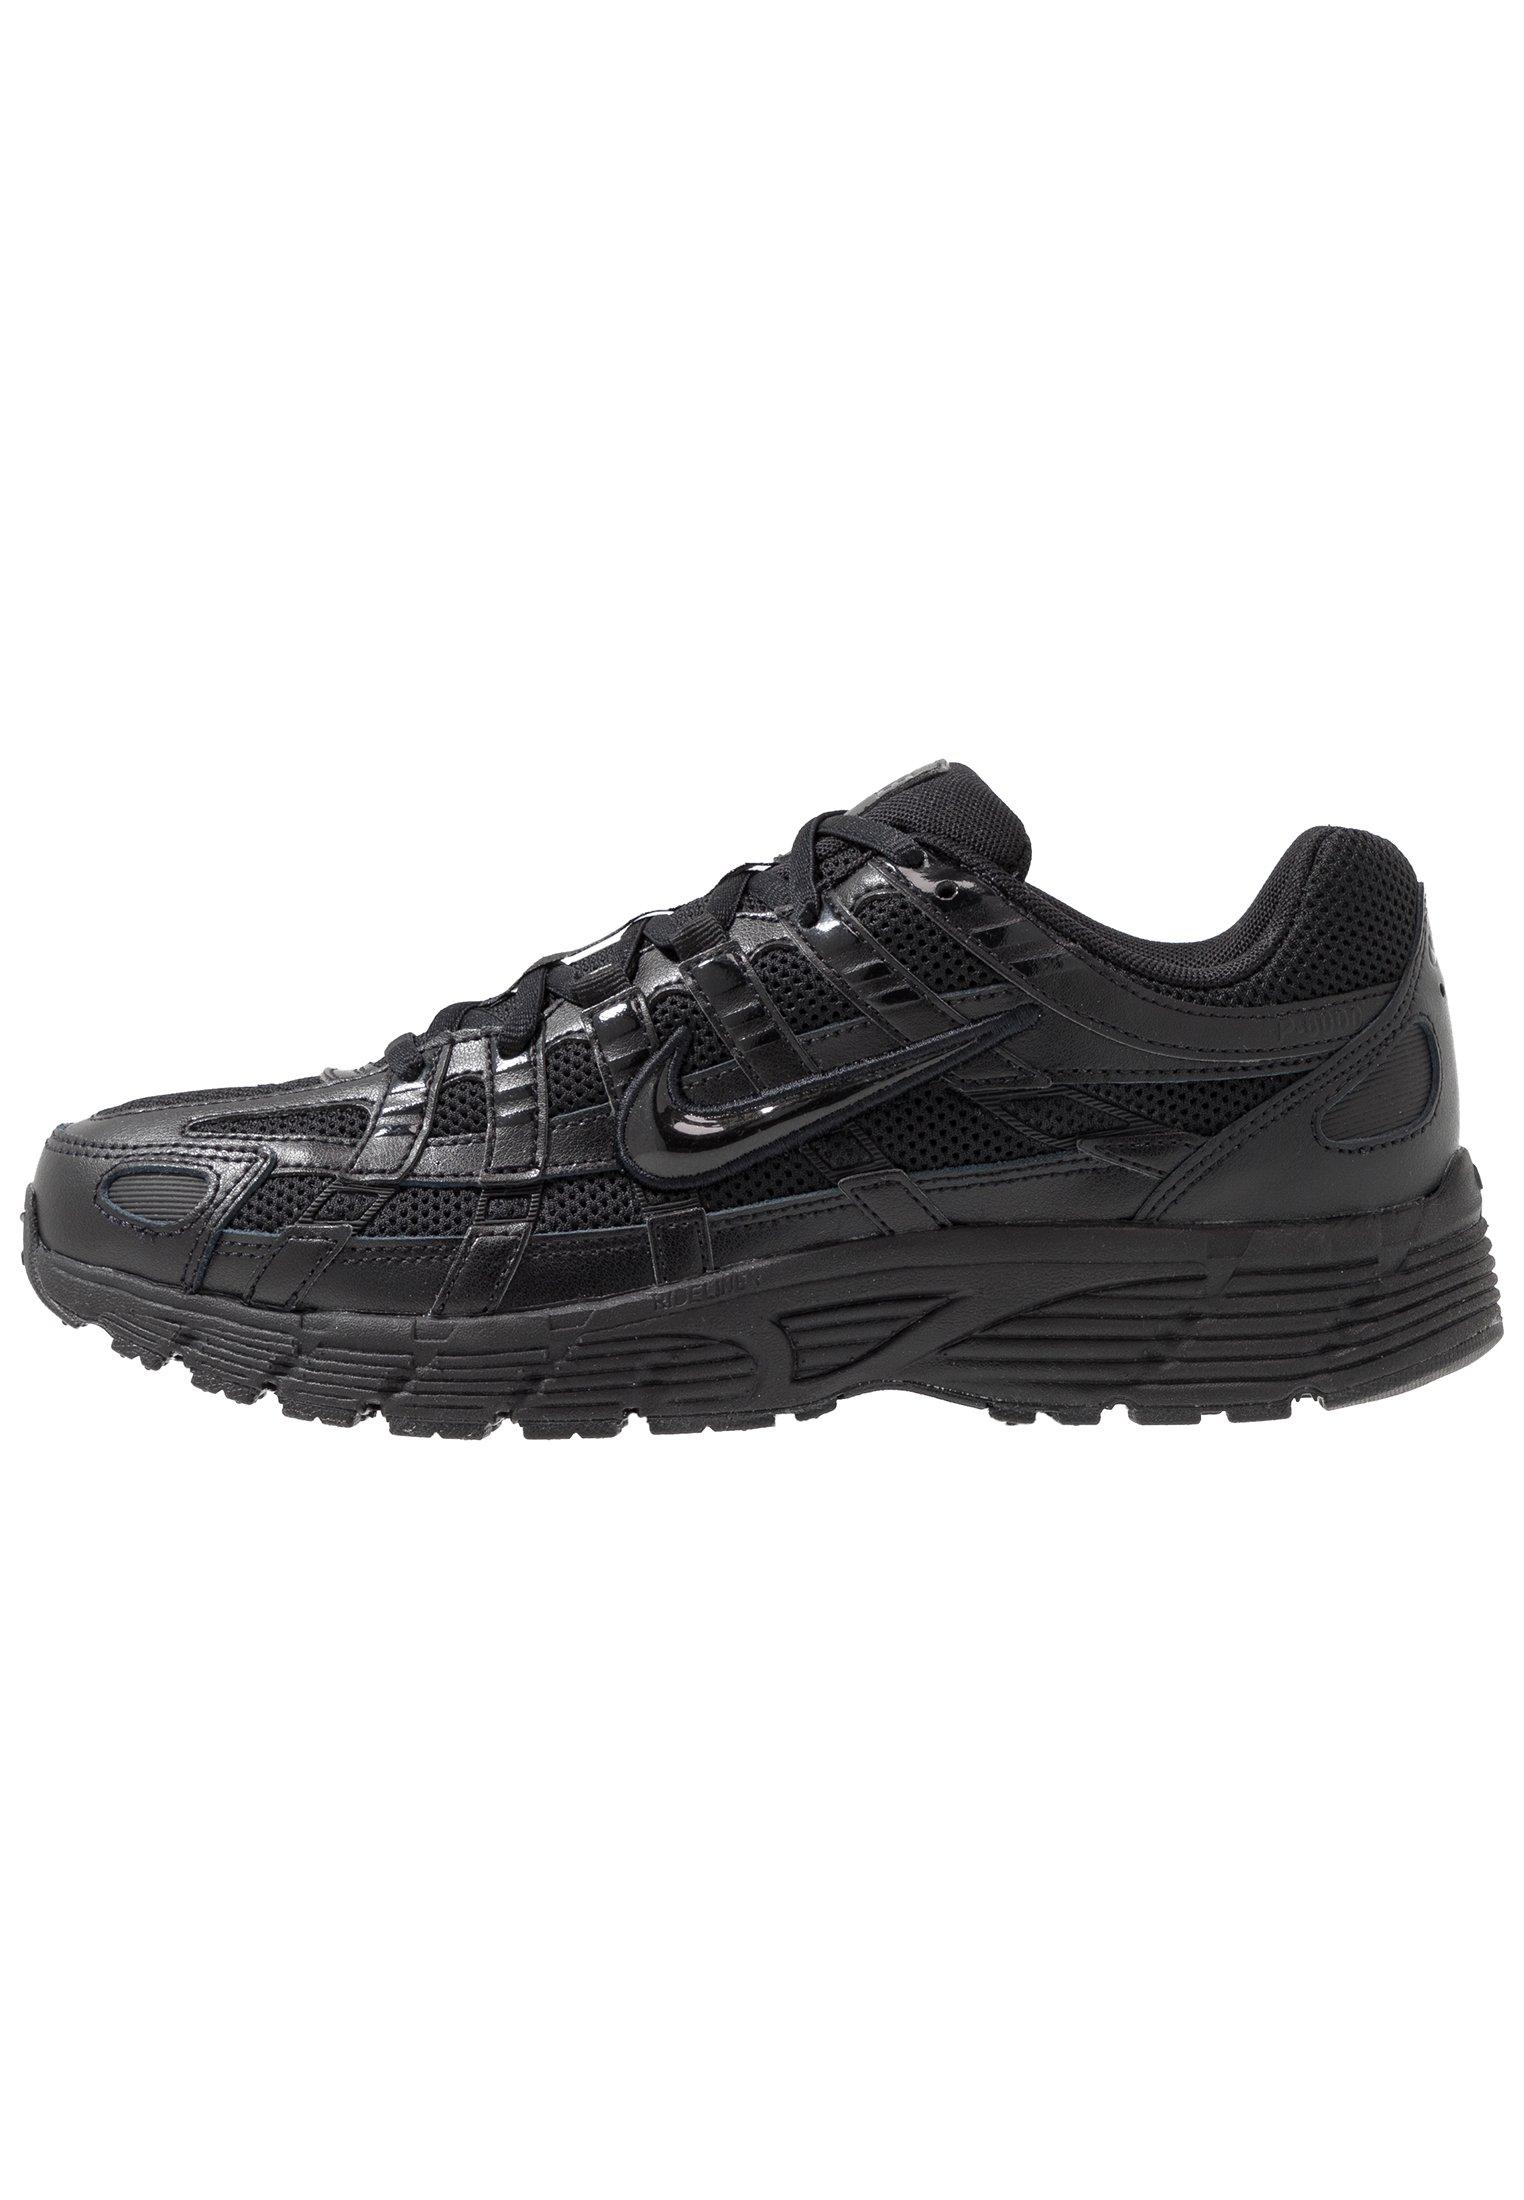 Nike Sportswear P-6000 - Baskets basses - black/noir - ZALANDO.FR